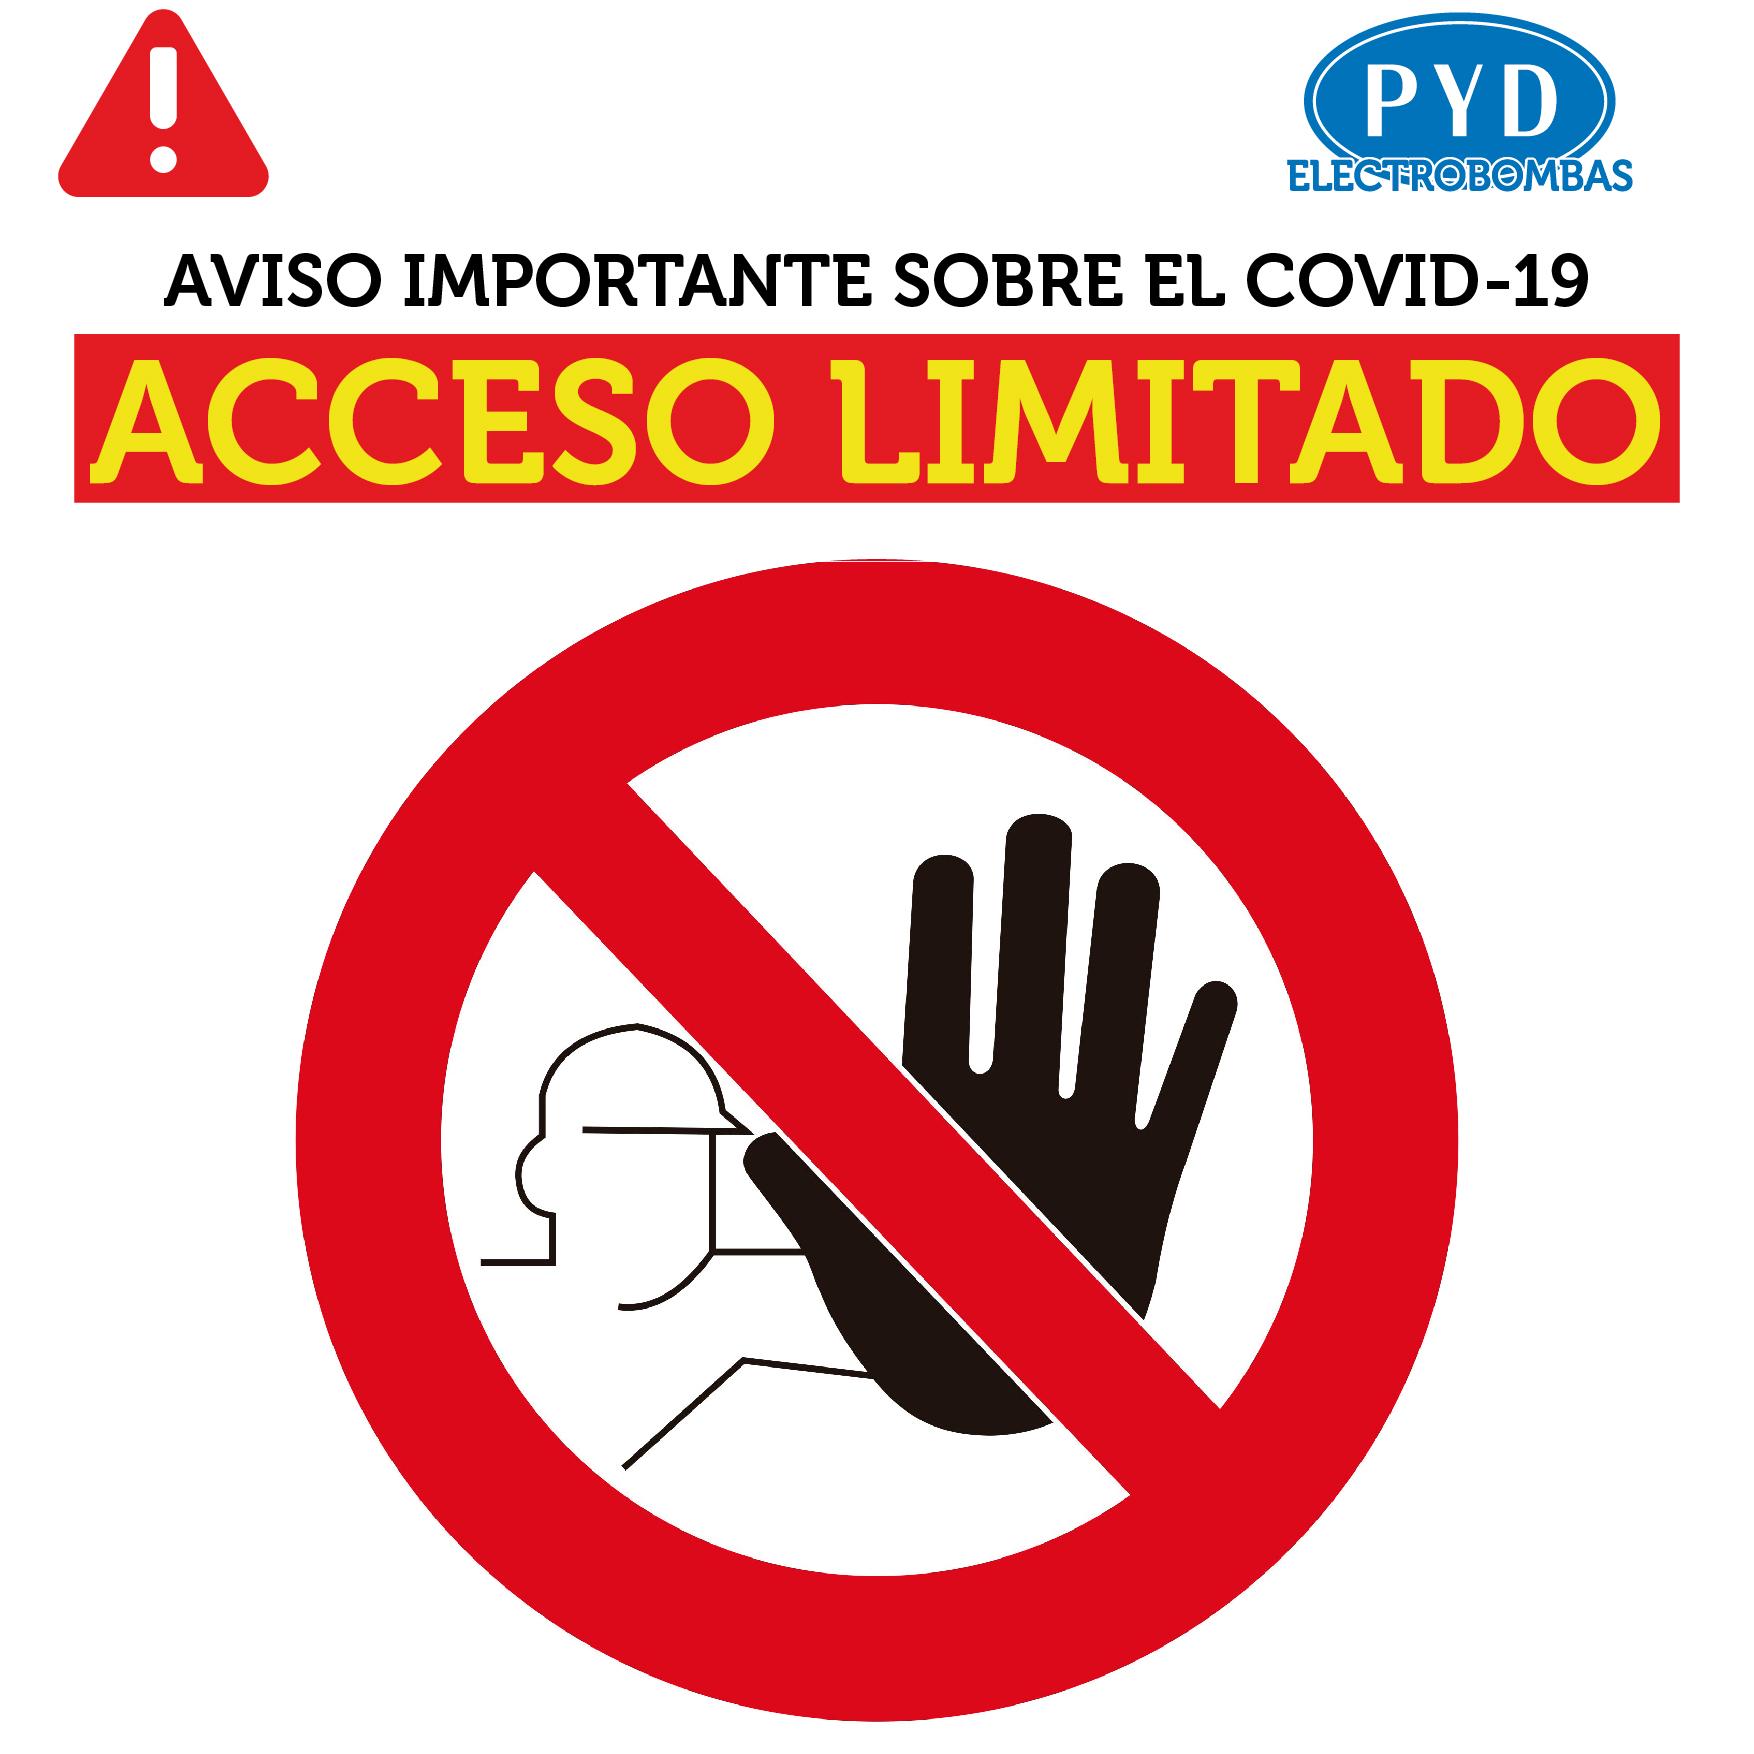 acceso limitado rrss 01 - acceso limitado rrss-01